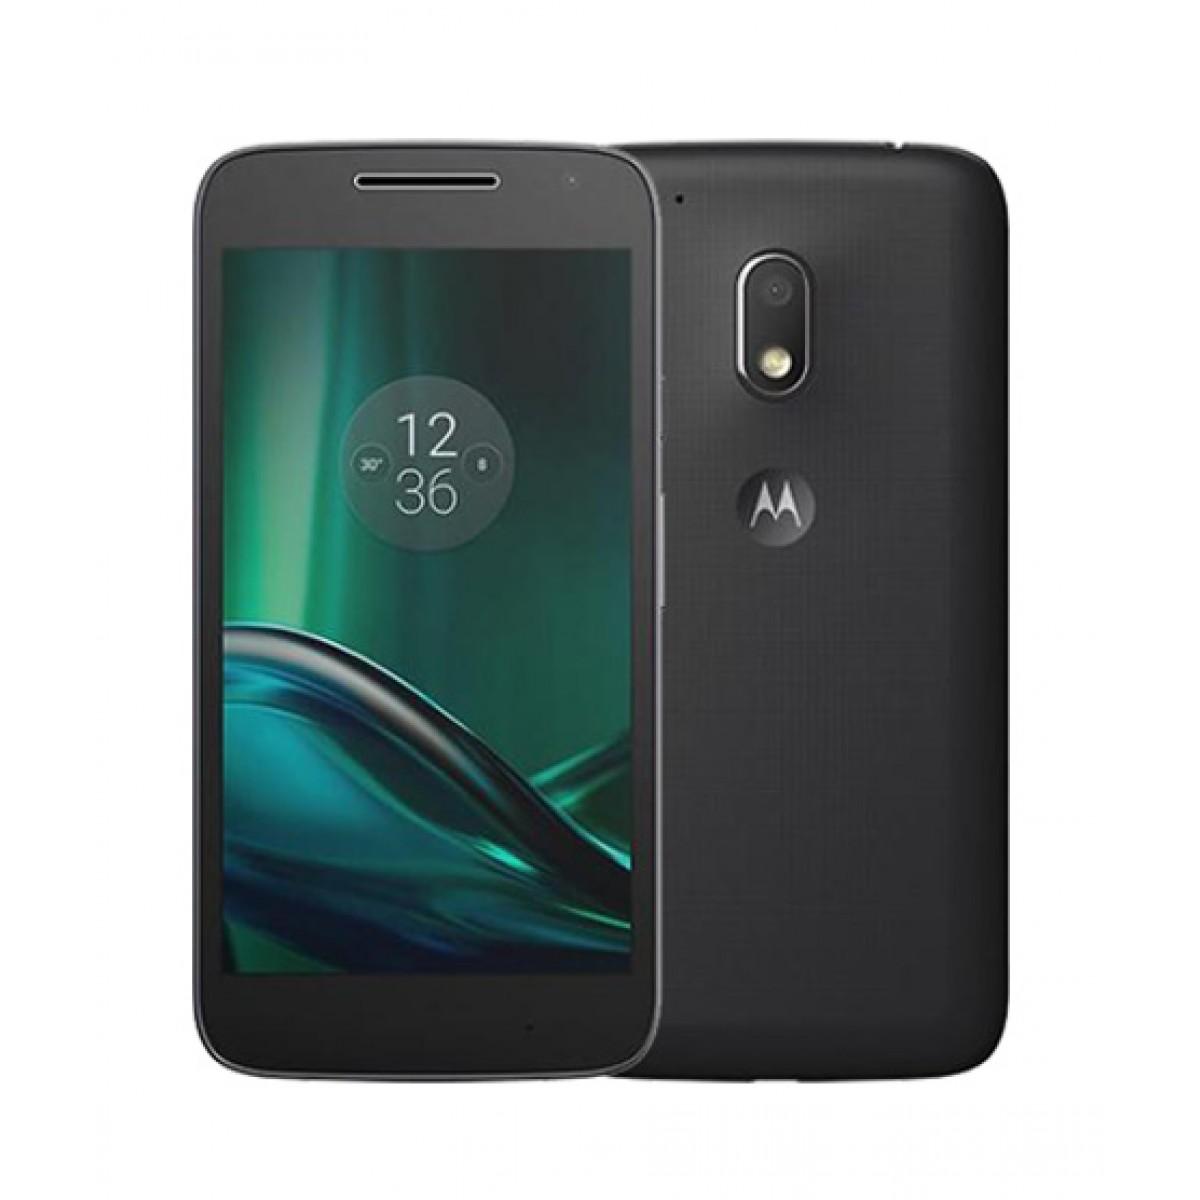 Motorola Moto G4 Play 4th Gen 16GB Black (XT1607)